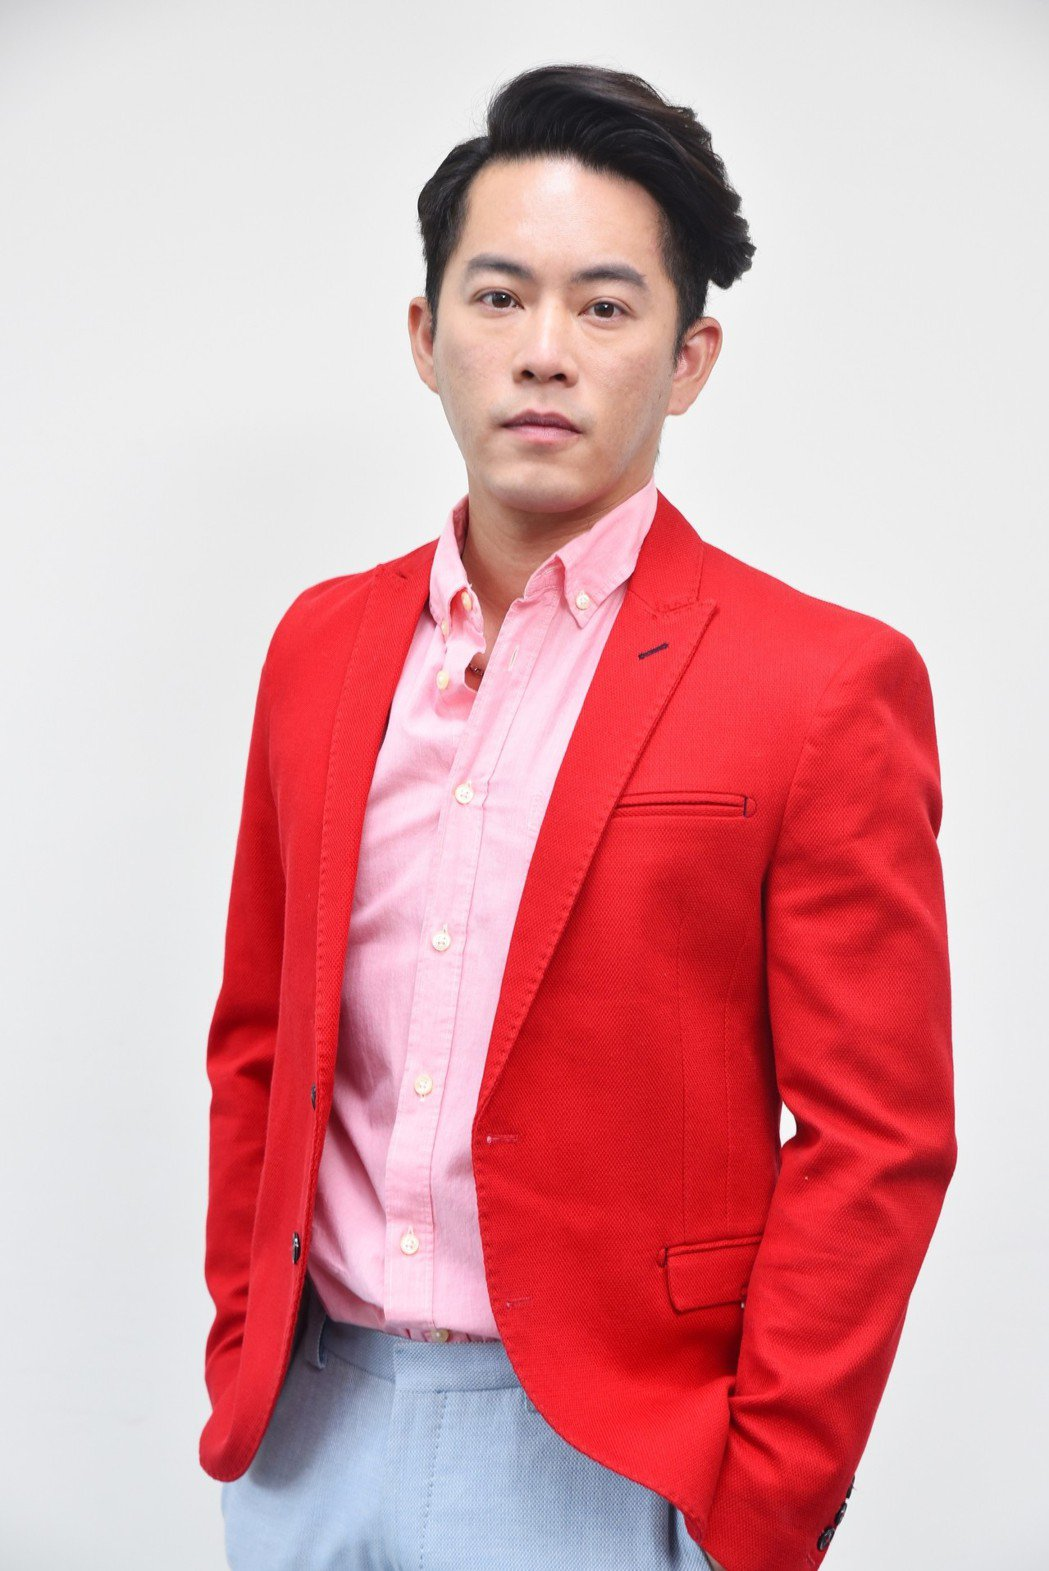 Junior韓宜邦演出新戲「魚躍龍門」。圖/緯來電影台提供